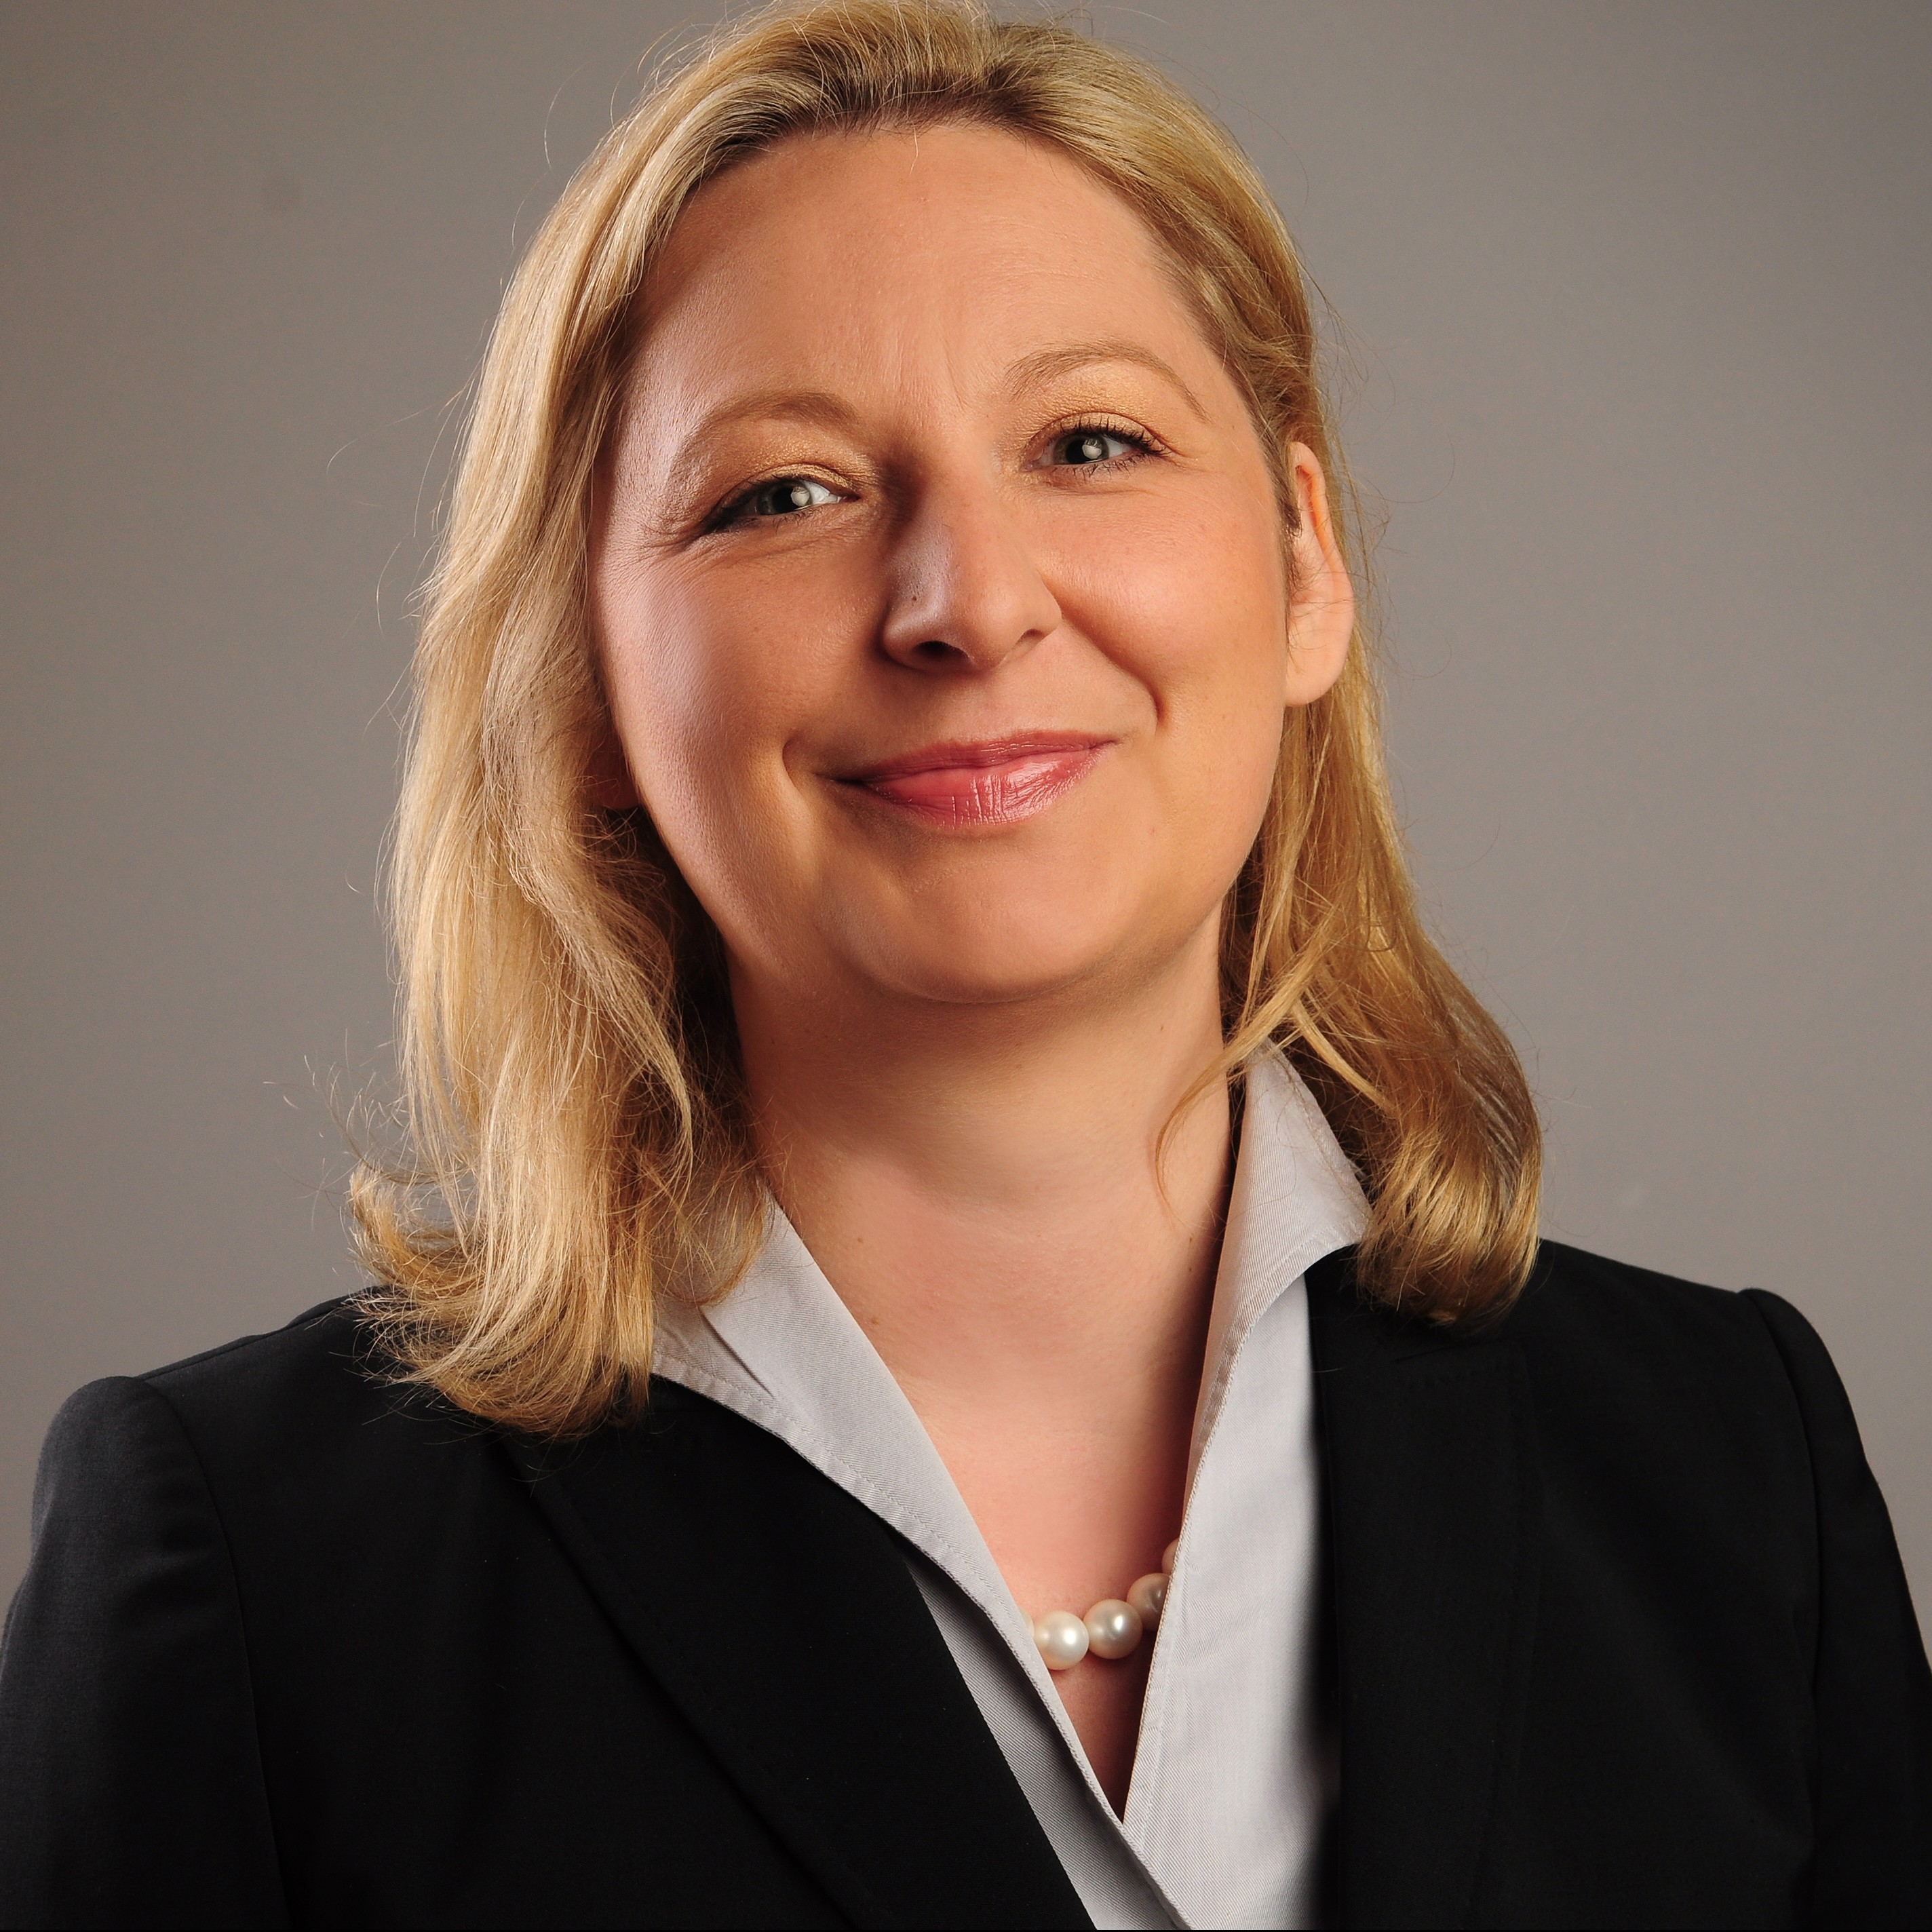 Rechtsanwältin Dr. Tamara Knöpfel